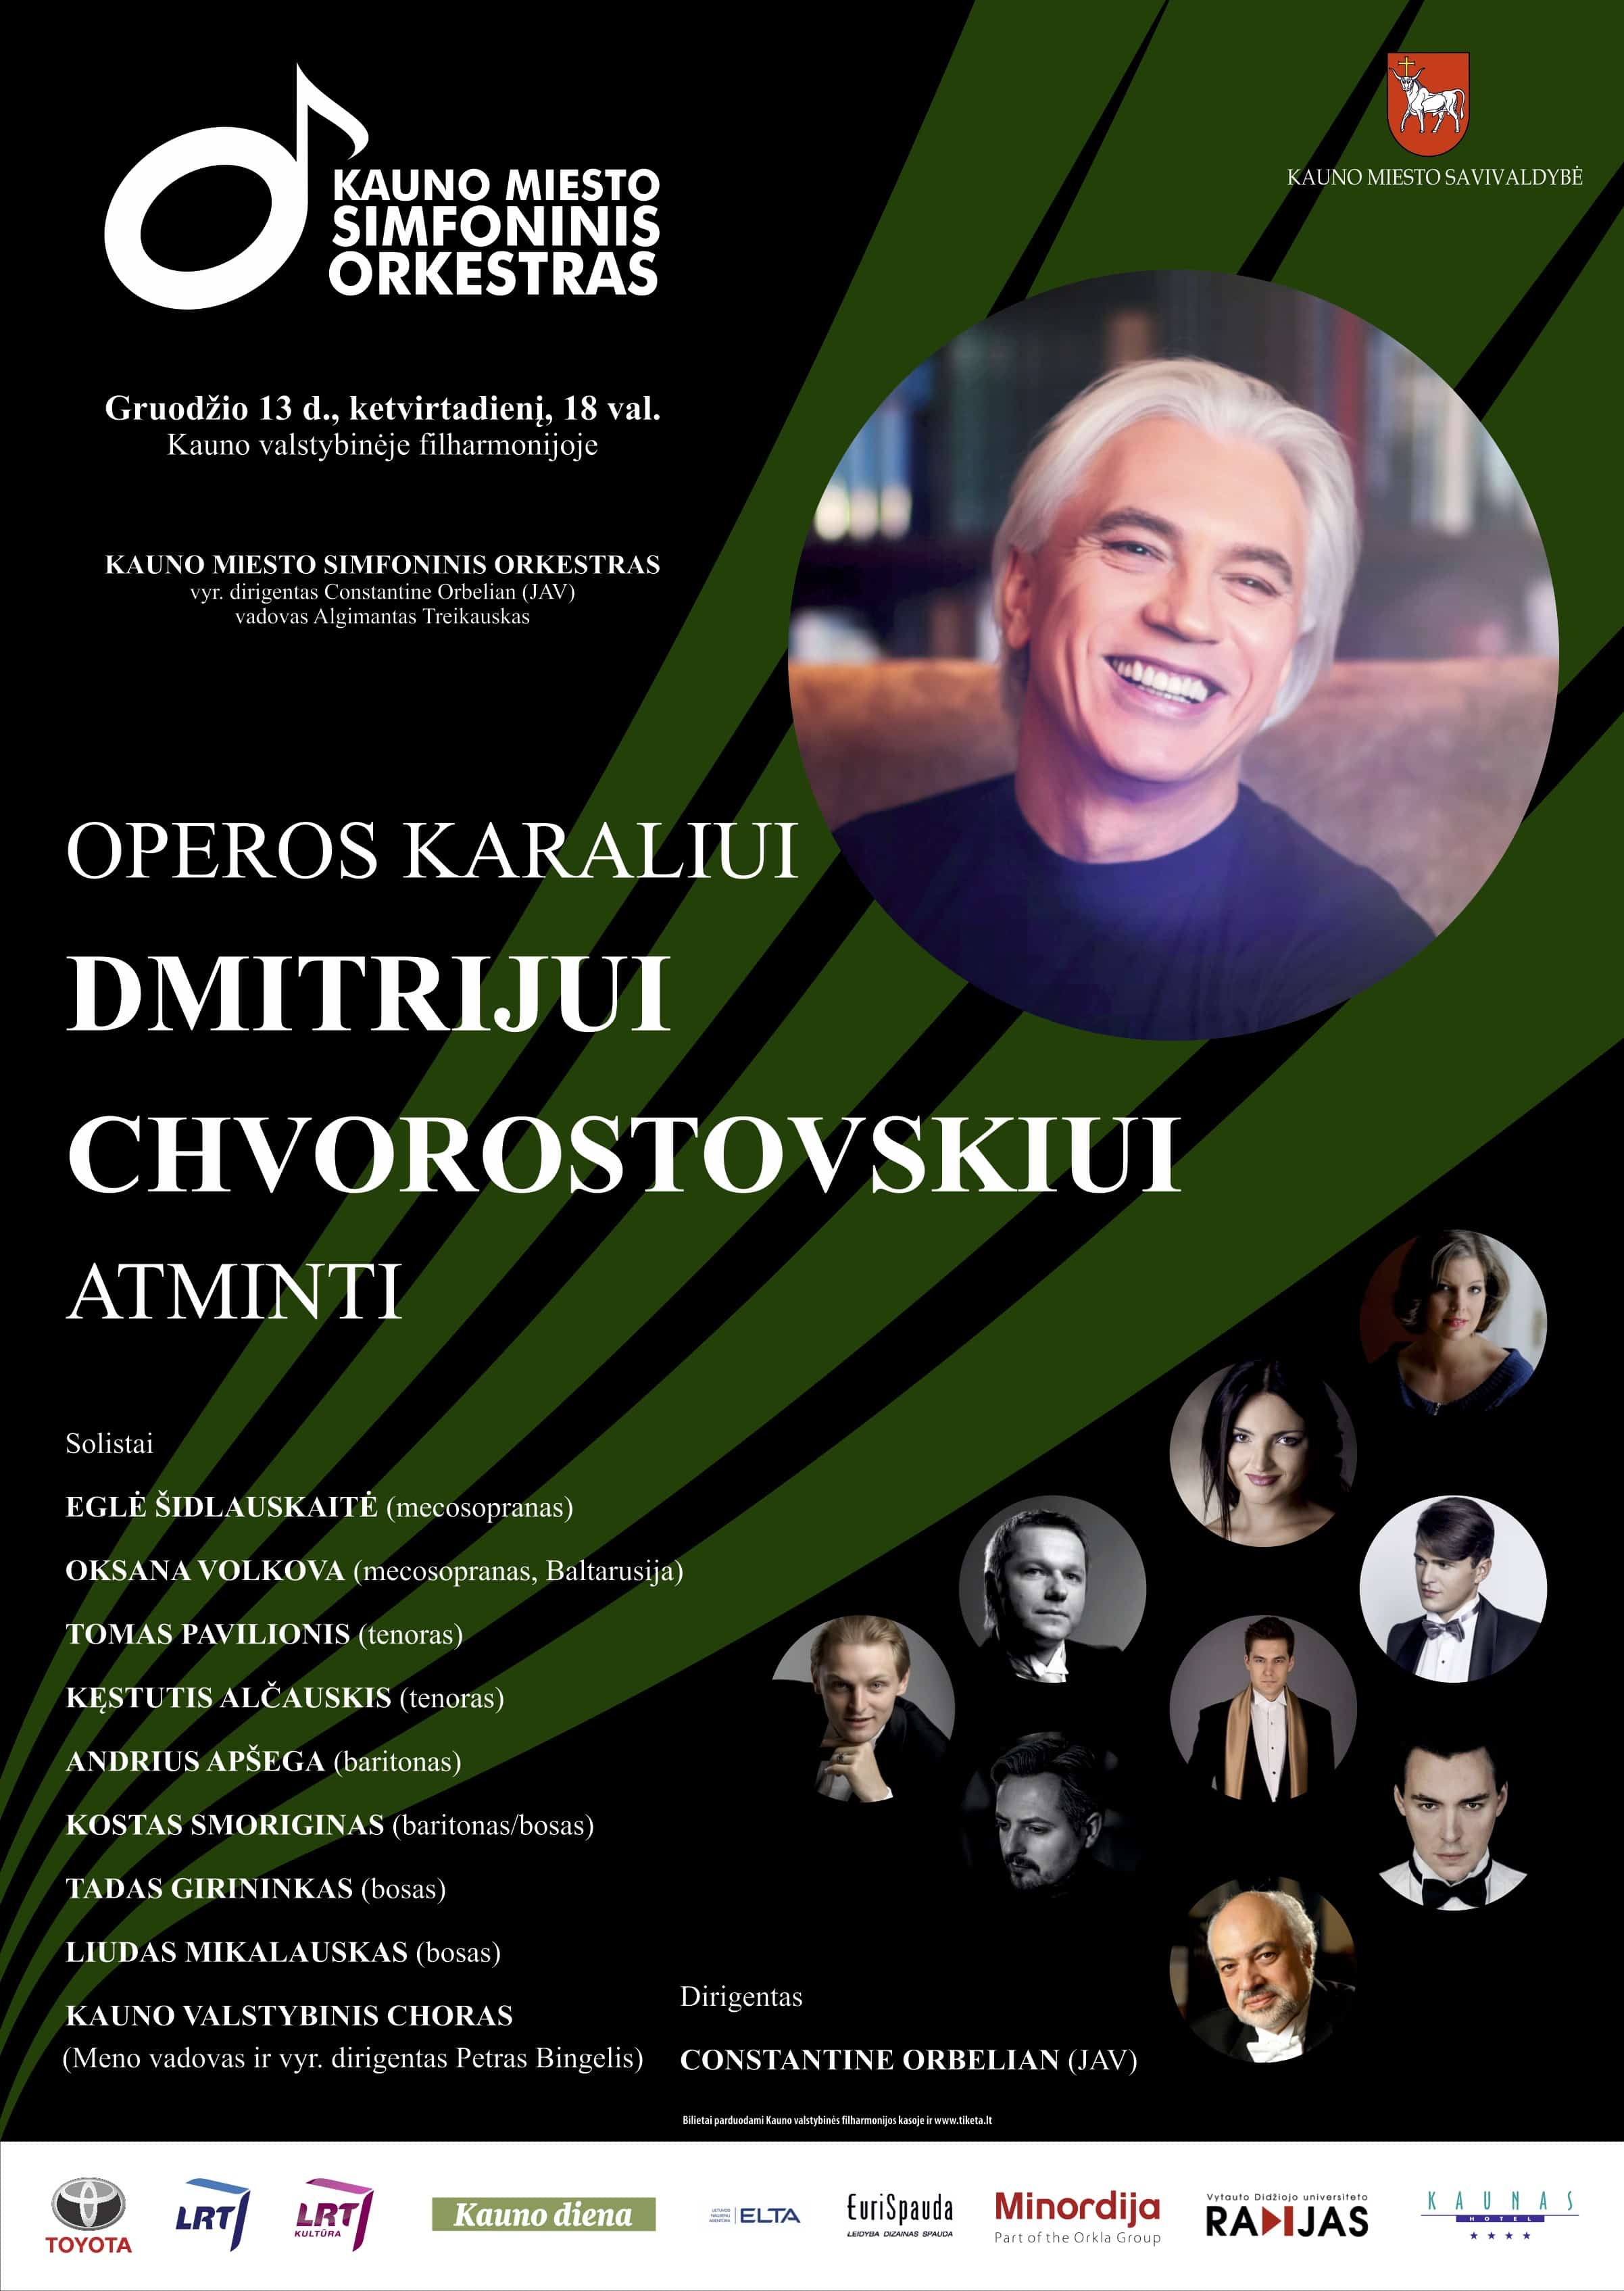 A Special 'In Memoriam' Concert for Dmitri Hvorostovsky - Poster from Kaunas